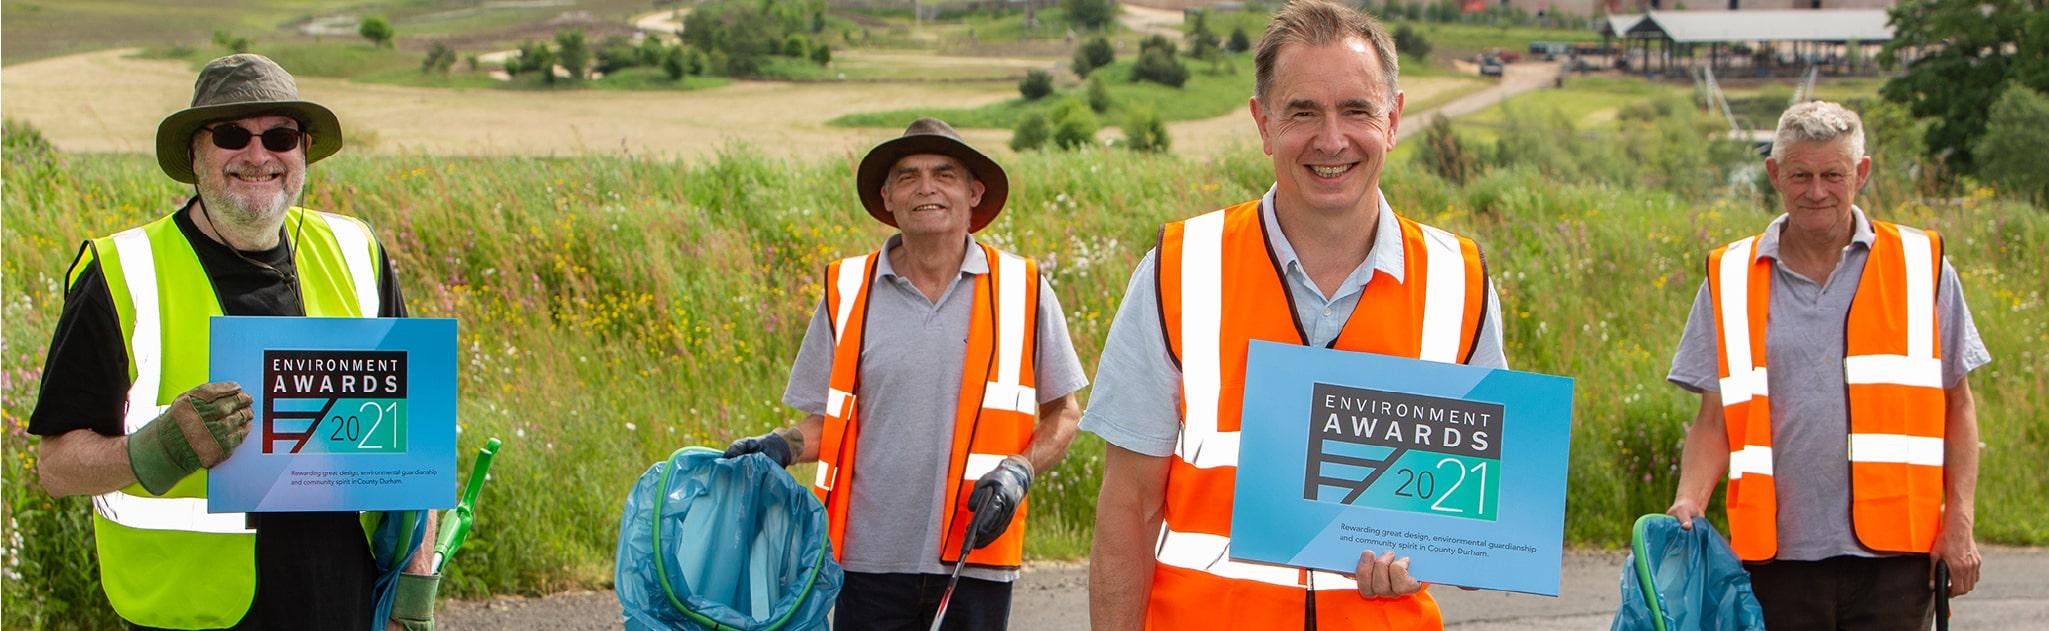 Men smiling litter picking with environment awards 2021